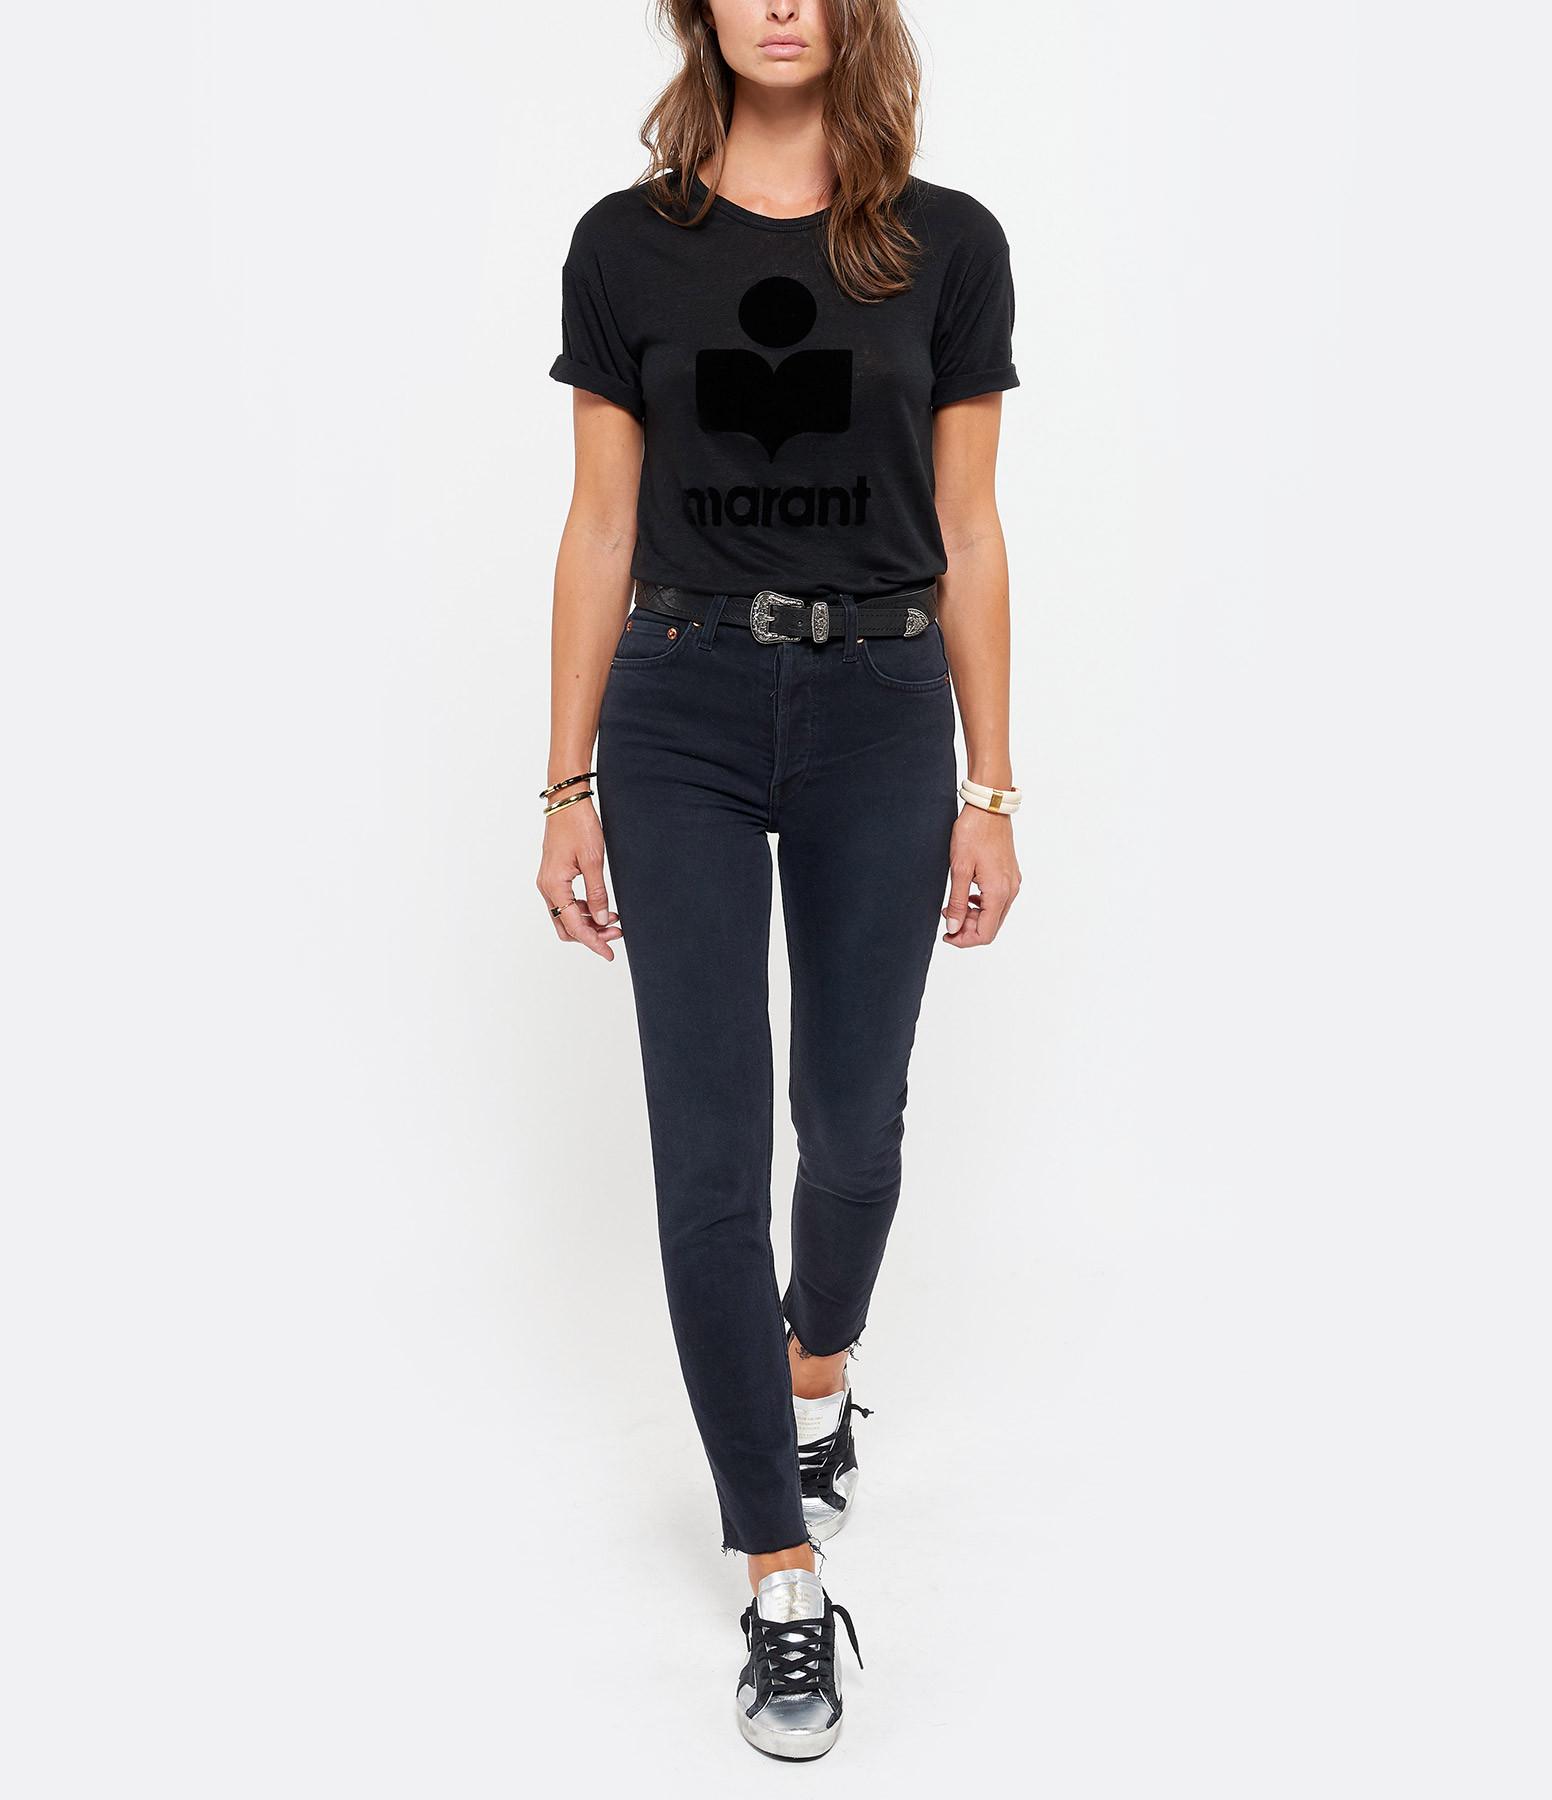 ISABEL MARANT ÉTOILE - Tee-shirt Koldi Lin Noir